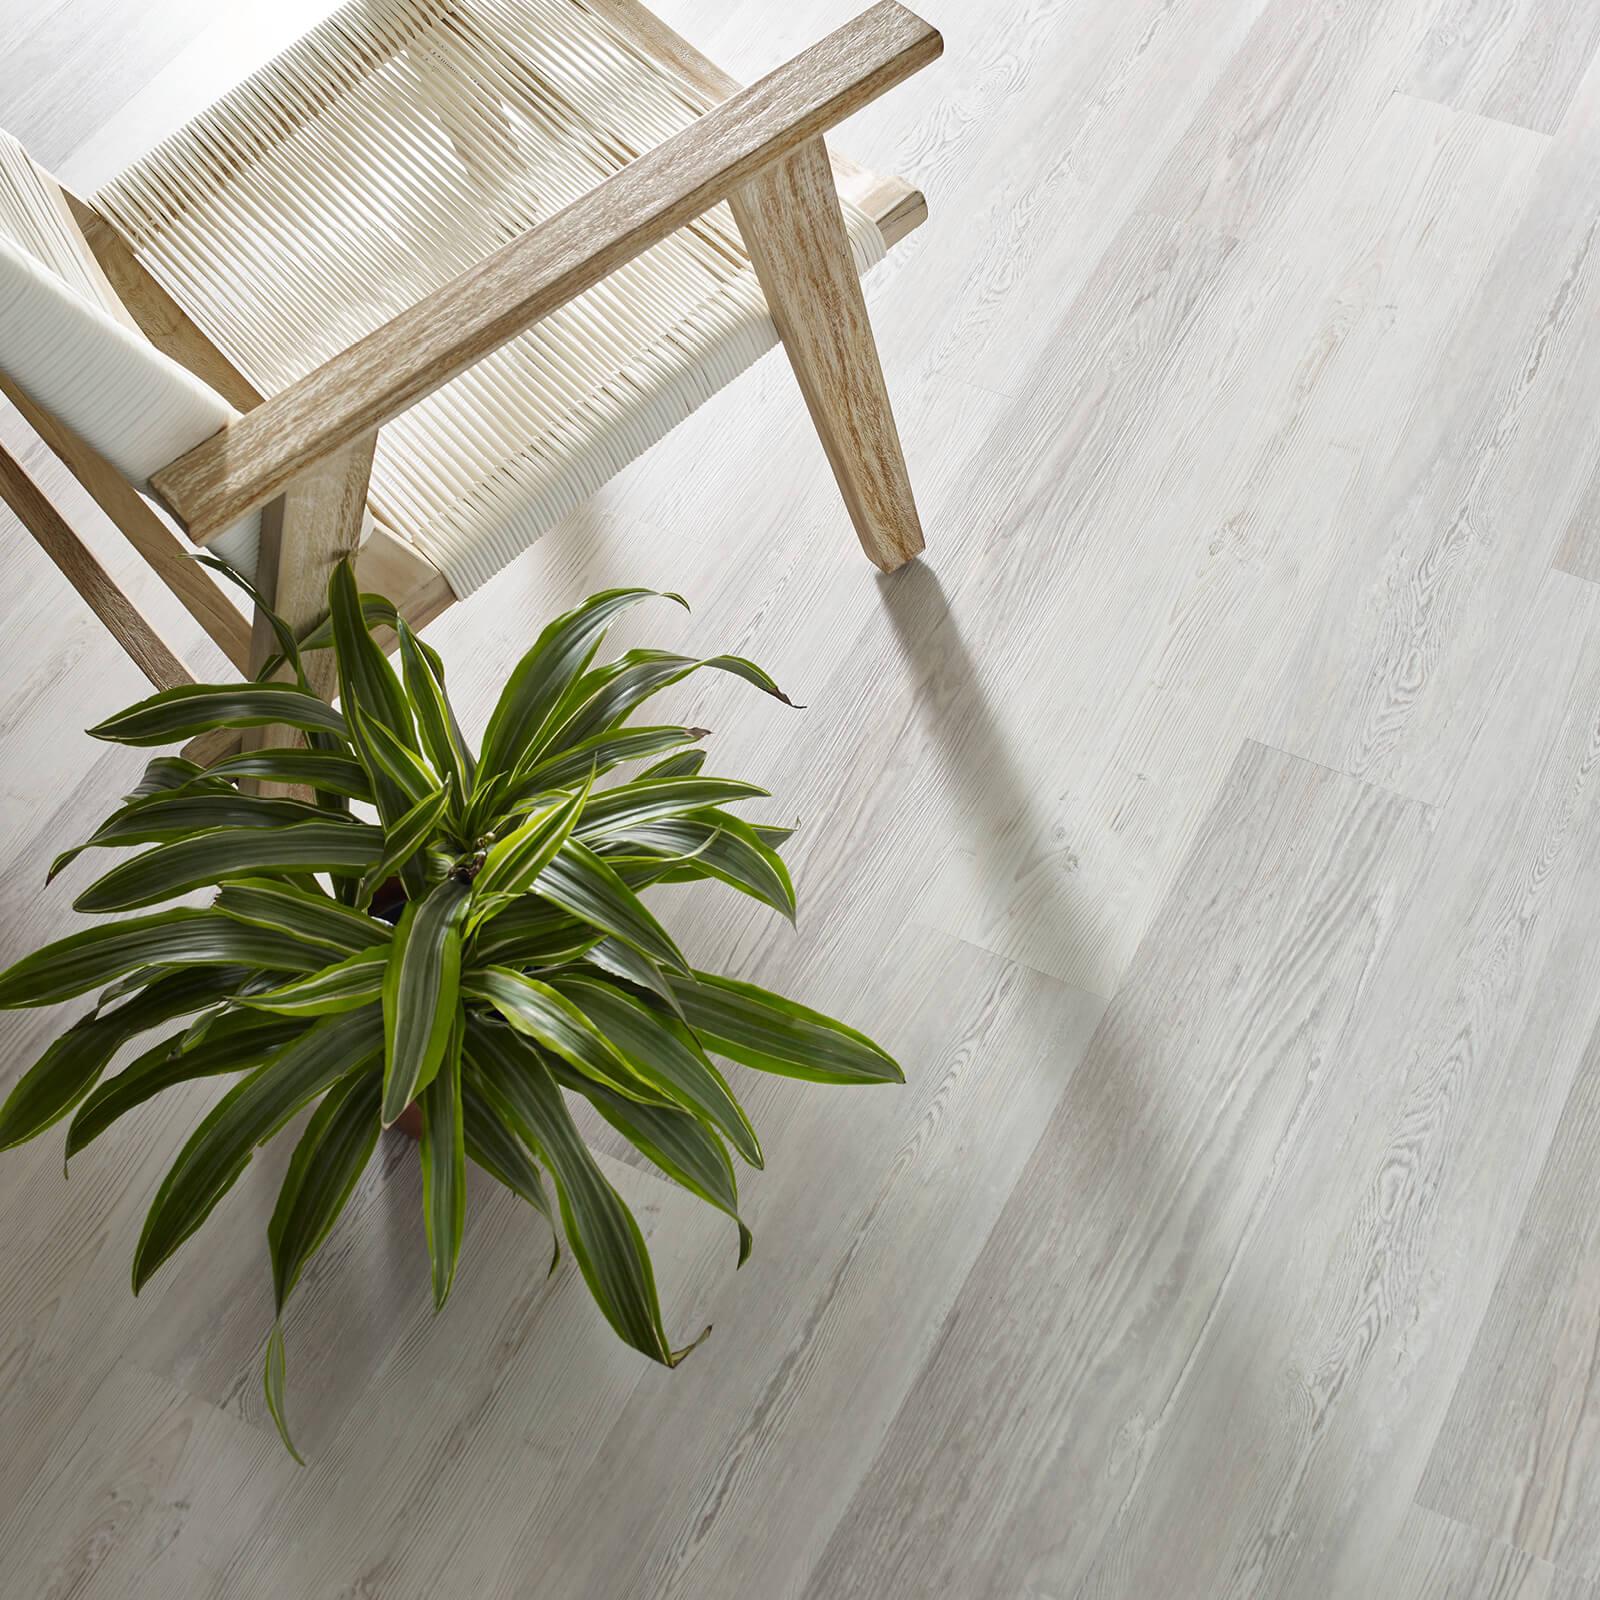 Century Pine floor | BMG Flooring & Tile Center